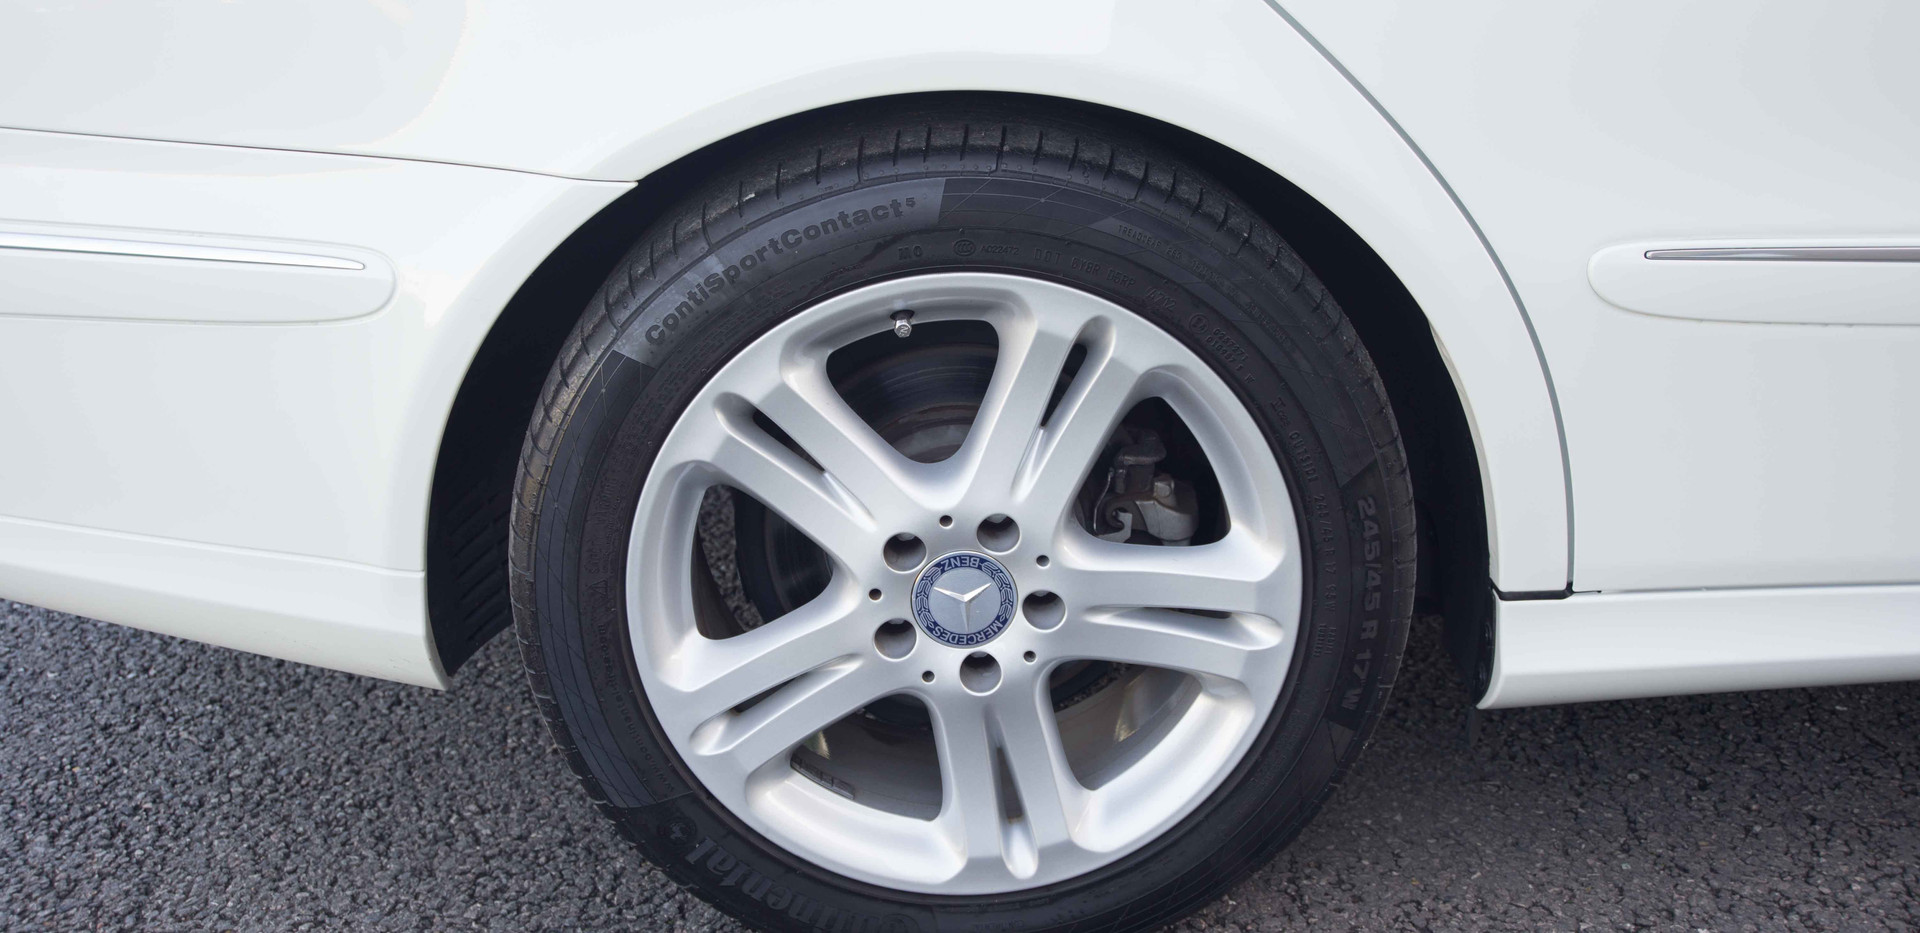 Mercedes E350 For Sale UK London  (21 of